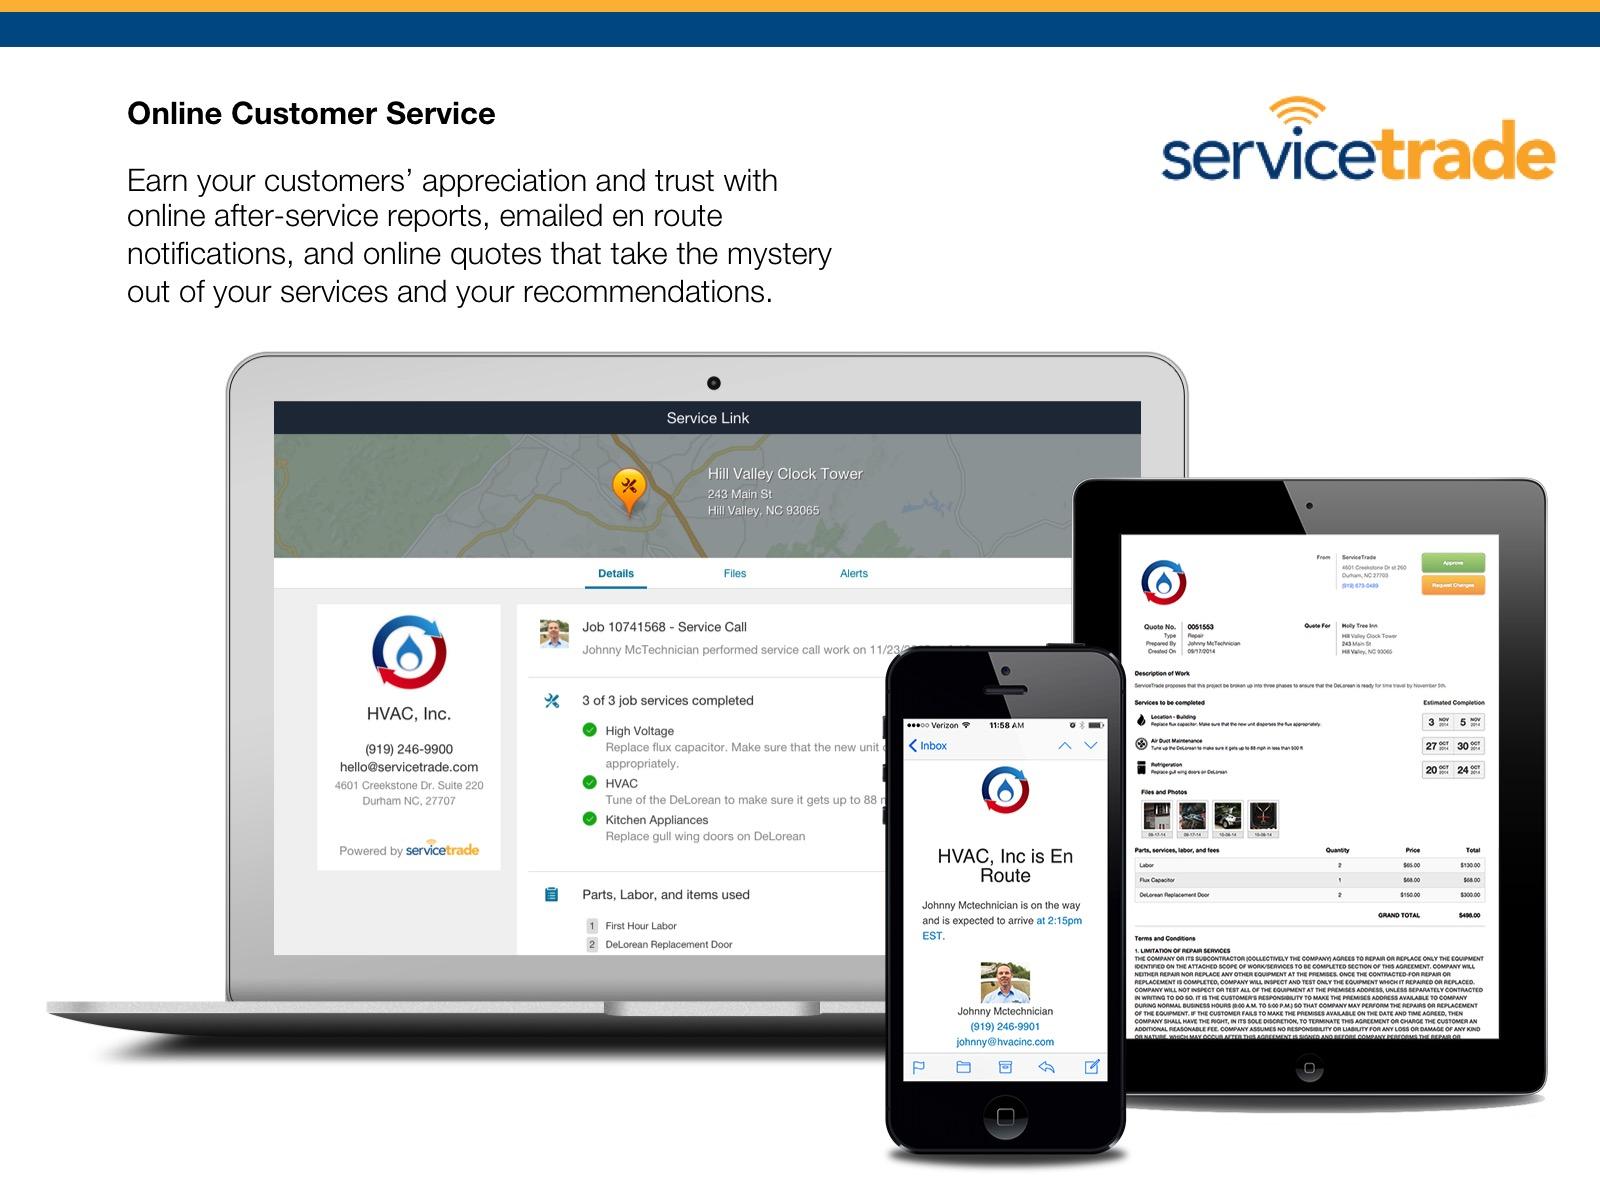 ServiceTrade Demo - Online Customer Service